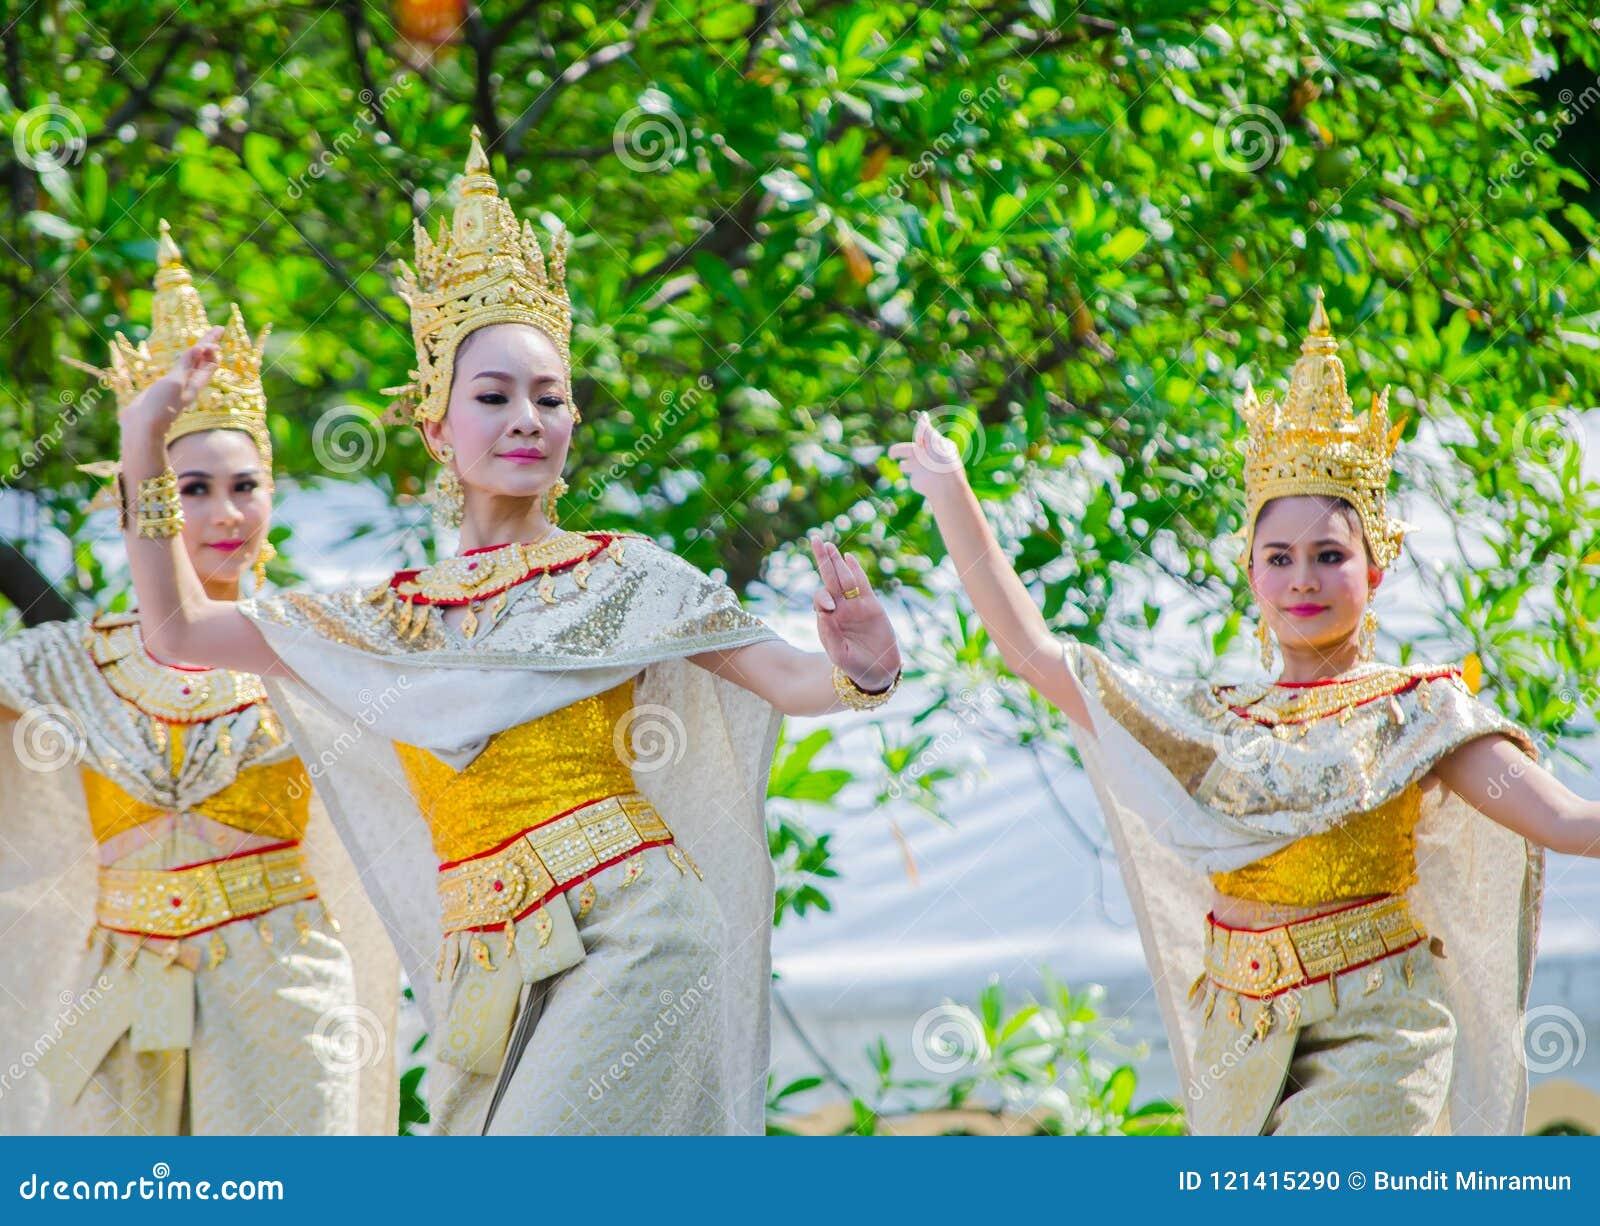 Dança tradicional tailandesa com a mulher bonita no traje cultural dourado que executa na fase para o festival de Songkran